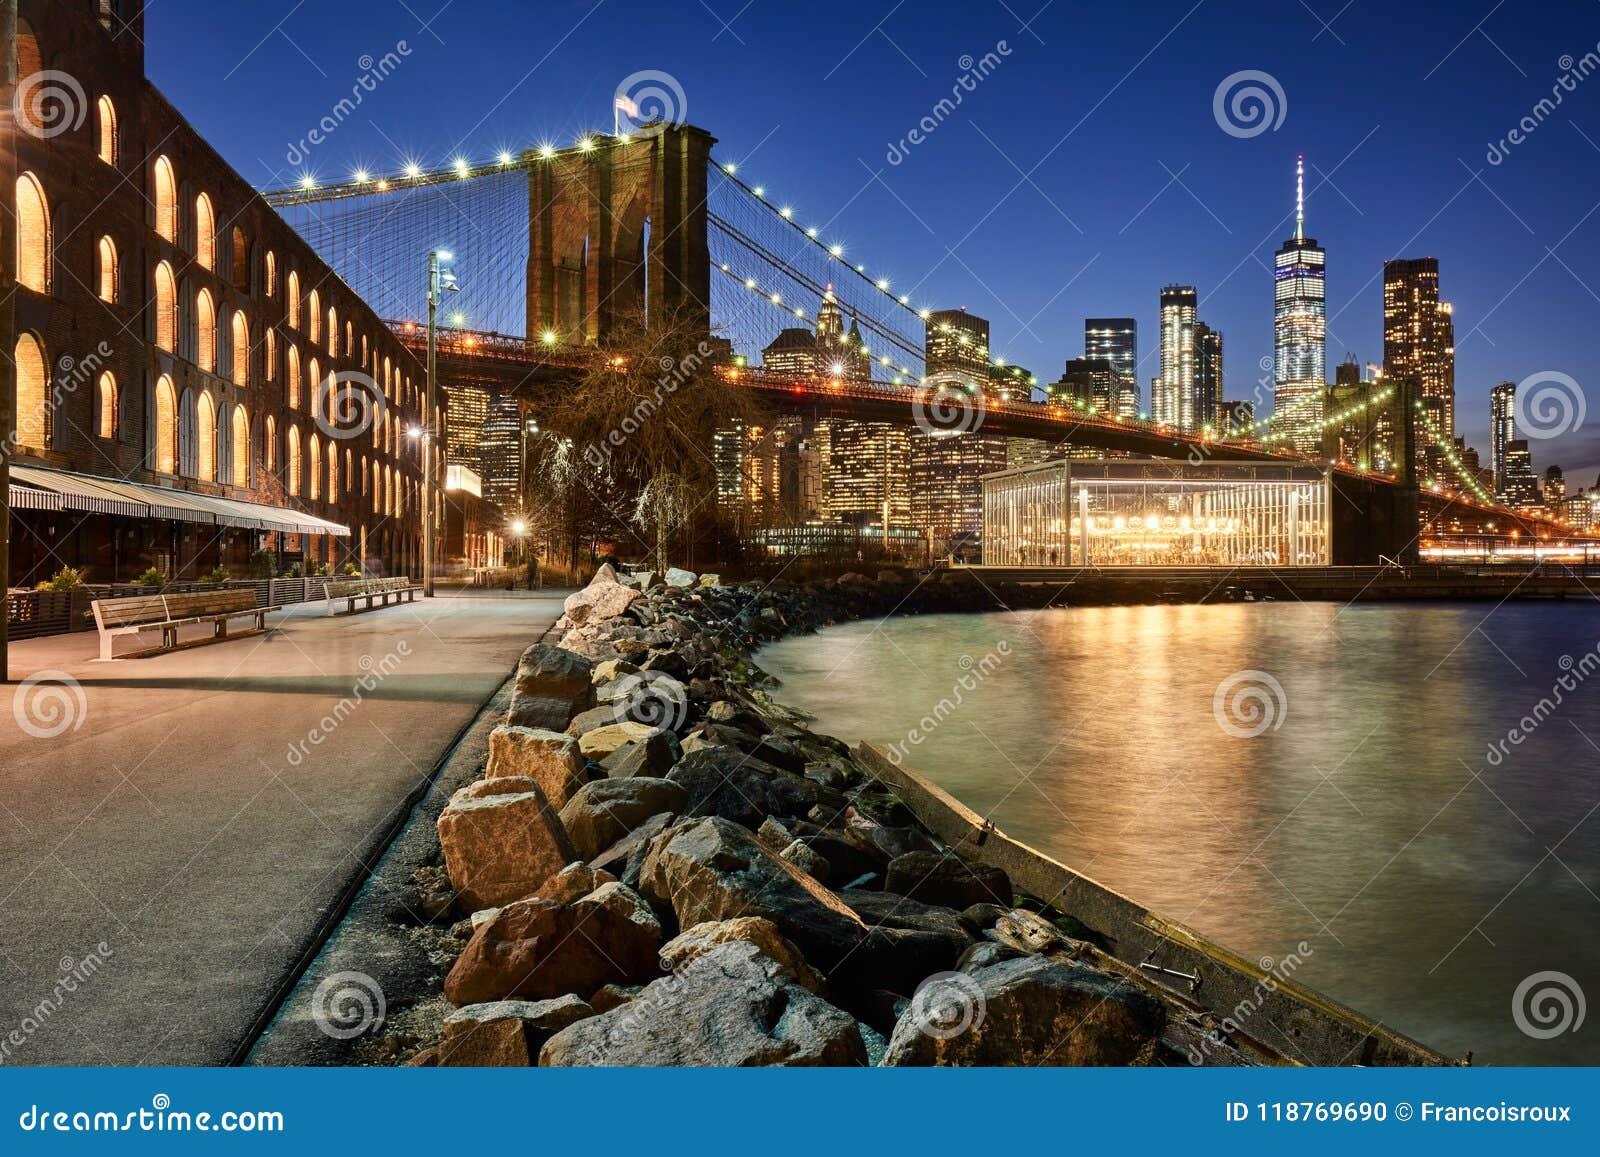 Brooklyn Bridge Park riverfront and Lower Manhattan at twilight. Brooklyn, Manhattan, New York City